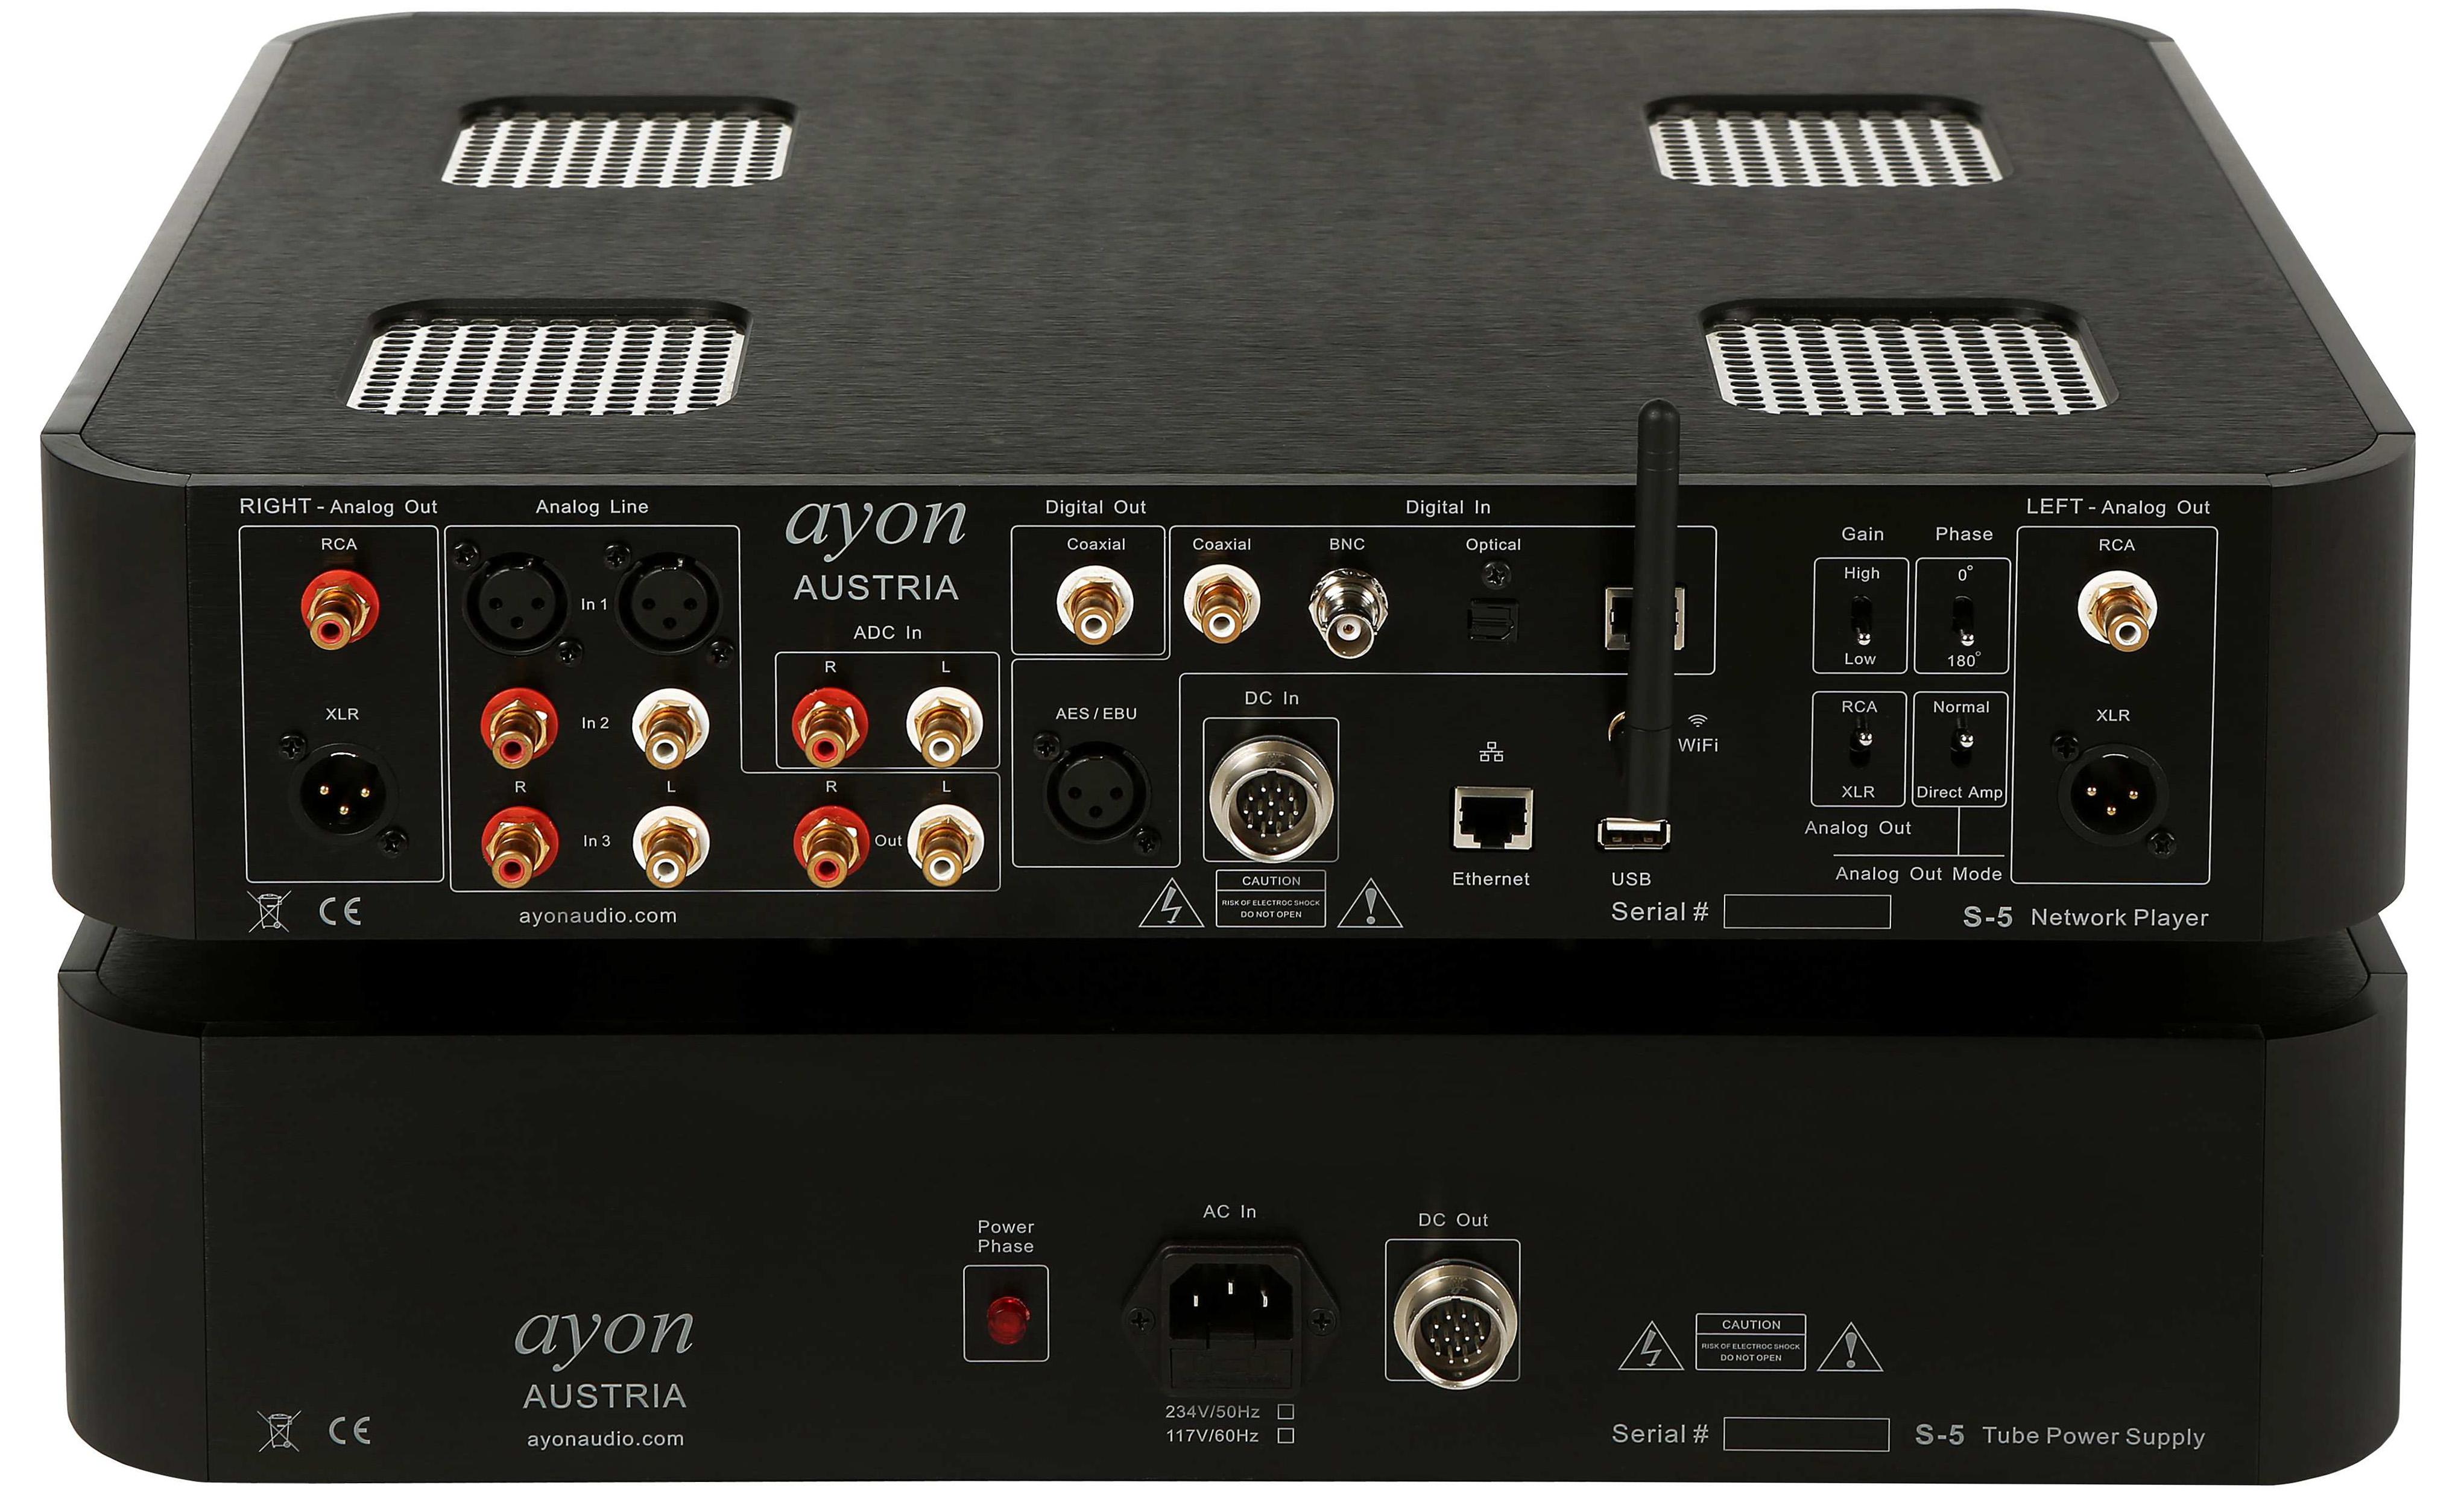 6moons audio reviews: Ayon Audio S-5